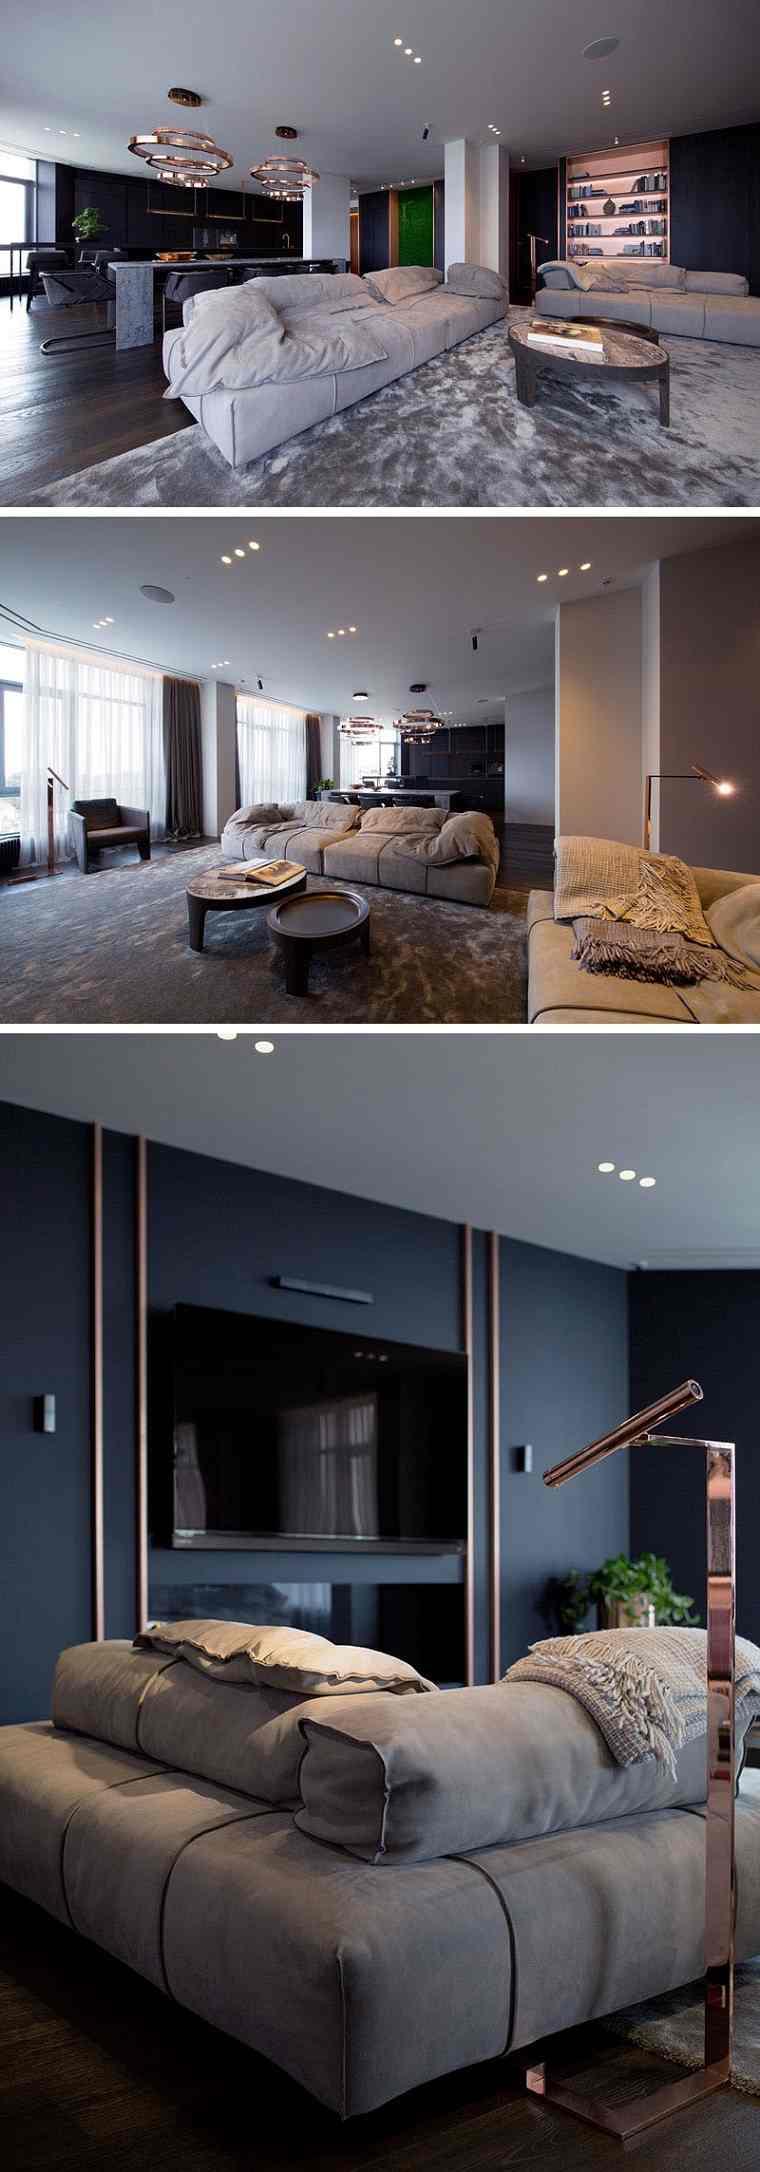 diseño de interior con acentos de cobre